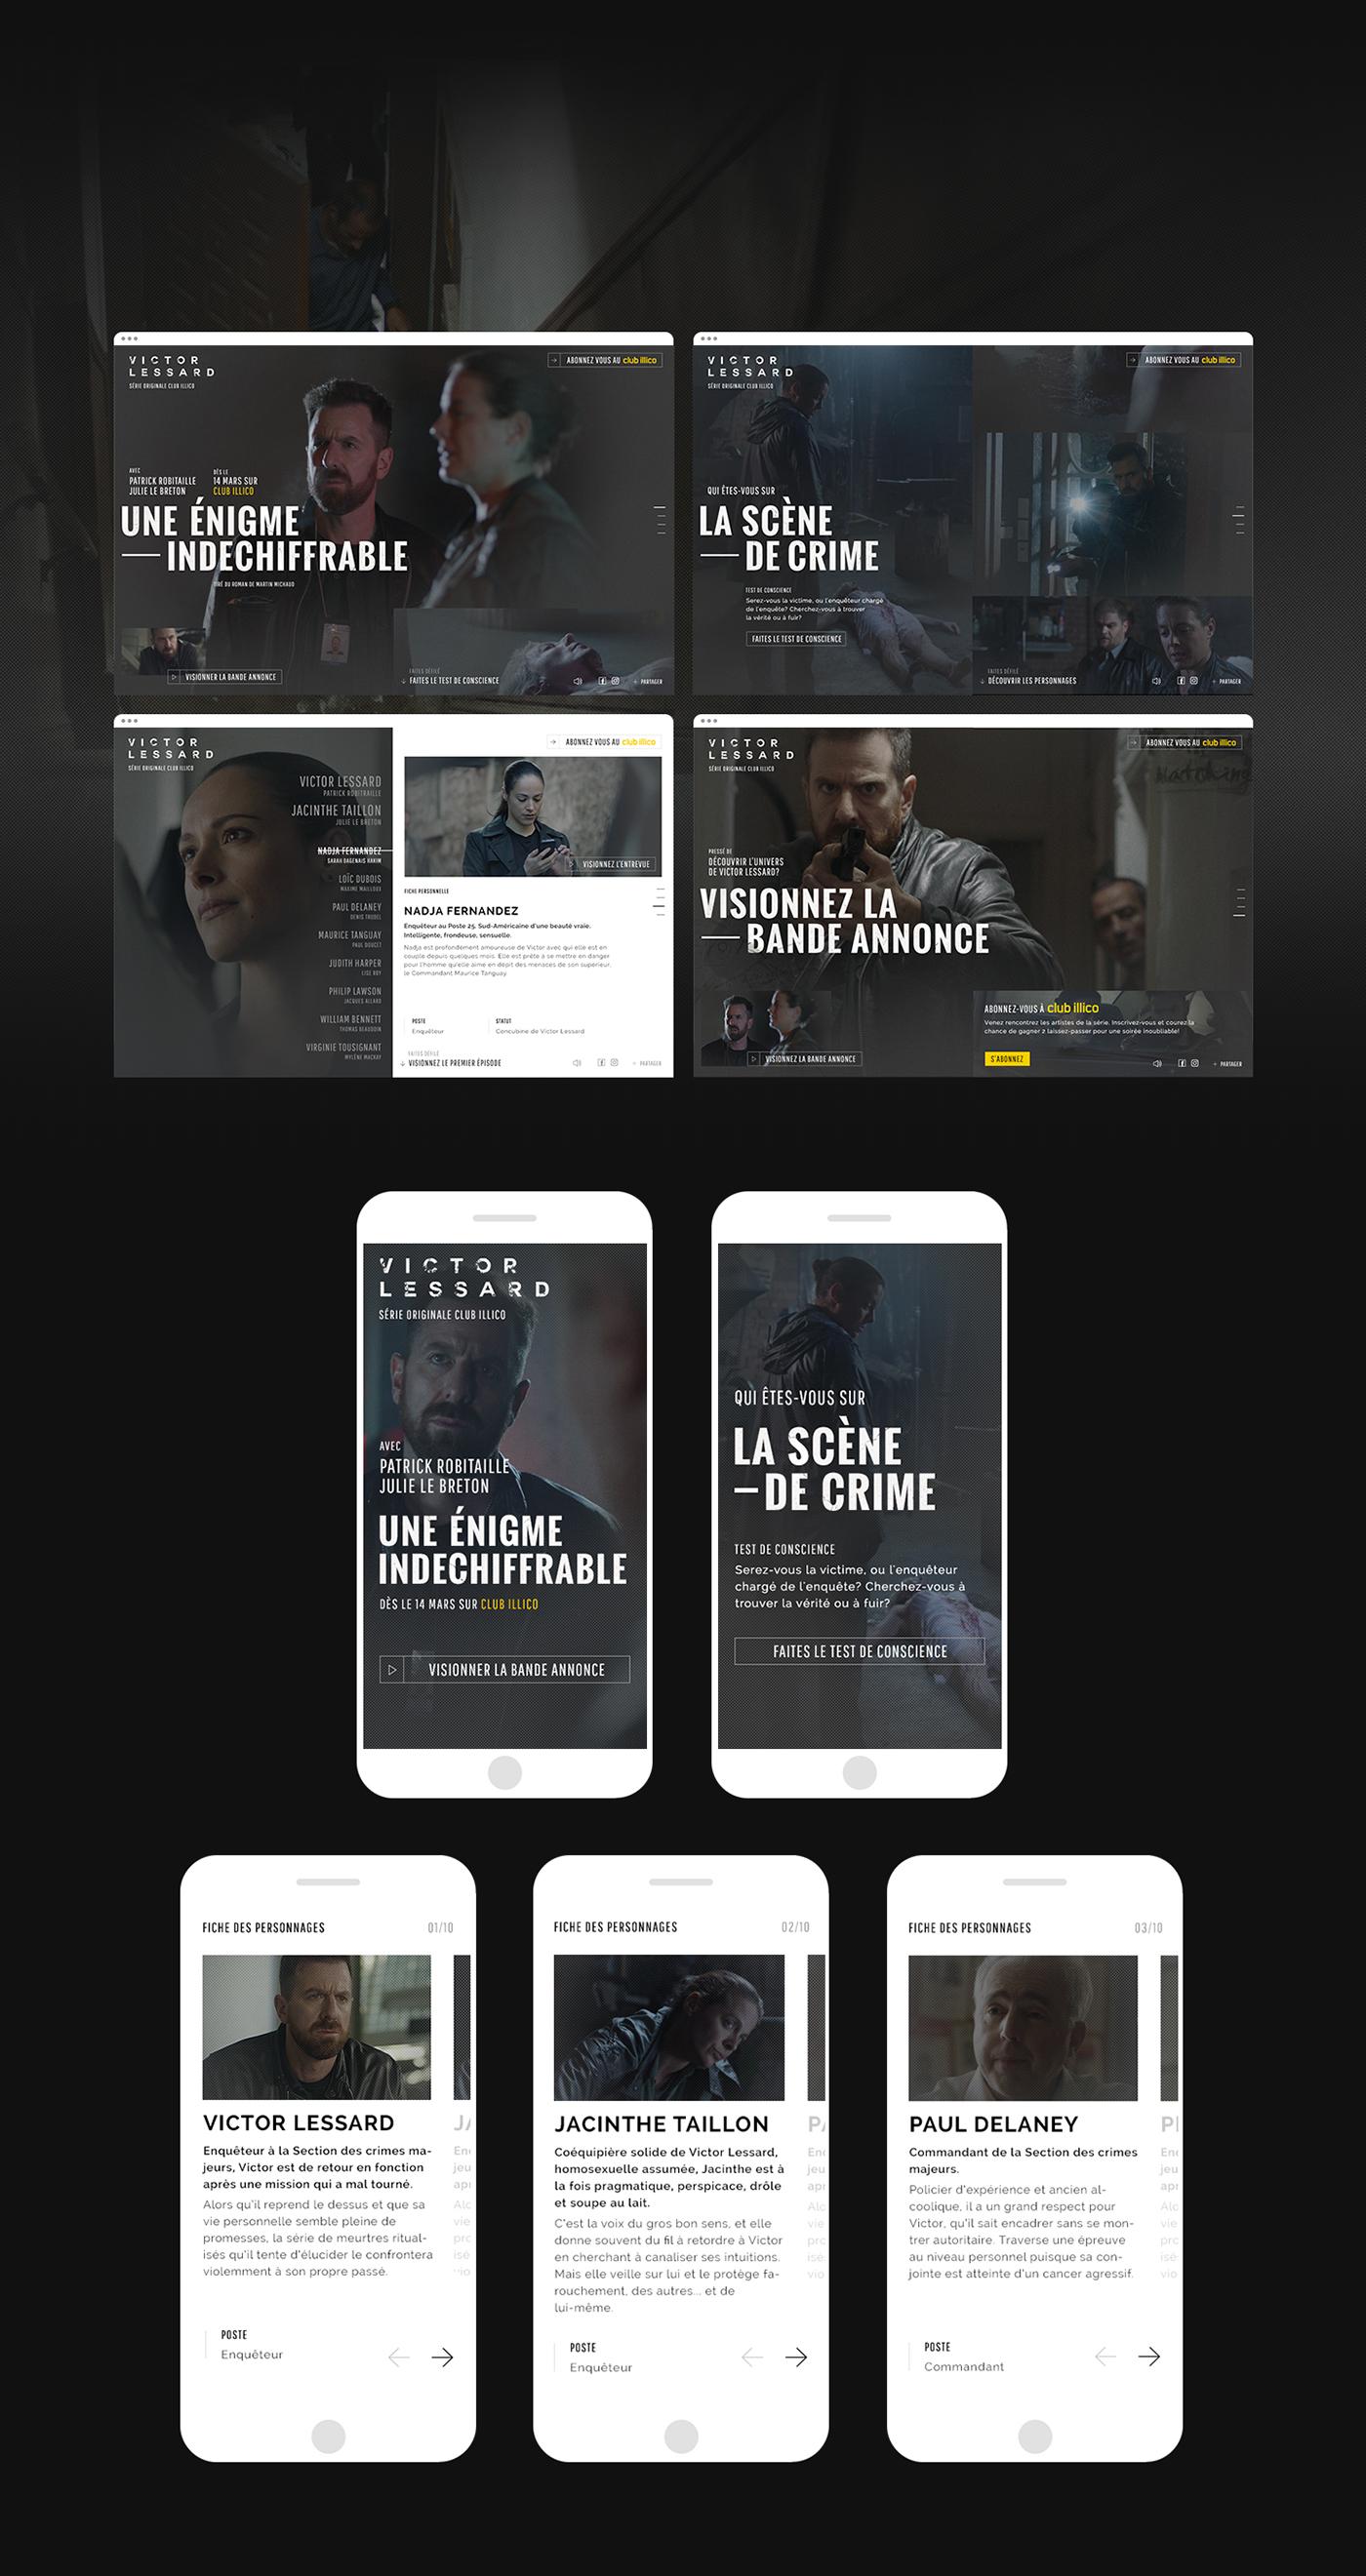 series tv tv show immersive Experience digital suspense thriller mystery police